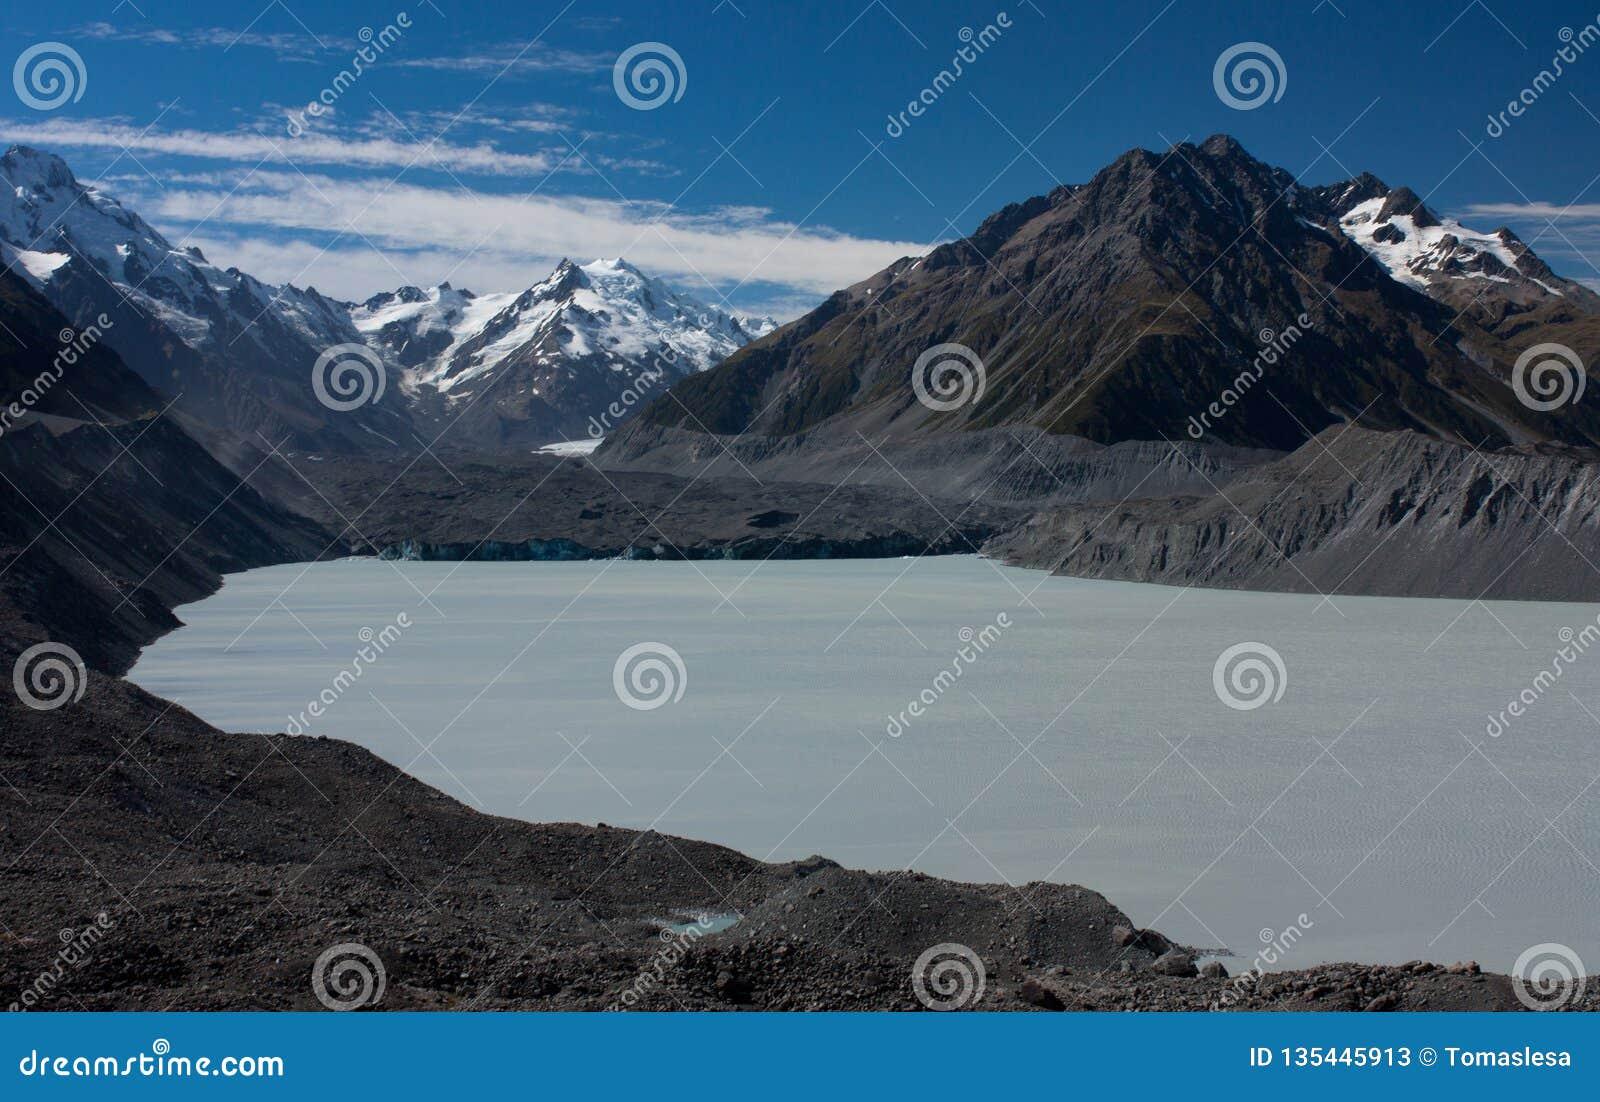 The Tasman Lake by the Tasman Glacier in the Aoraki / Mt. Cook National Park in the South Island in New Zealand